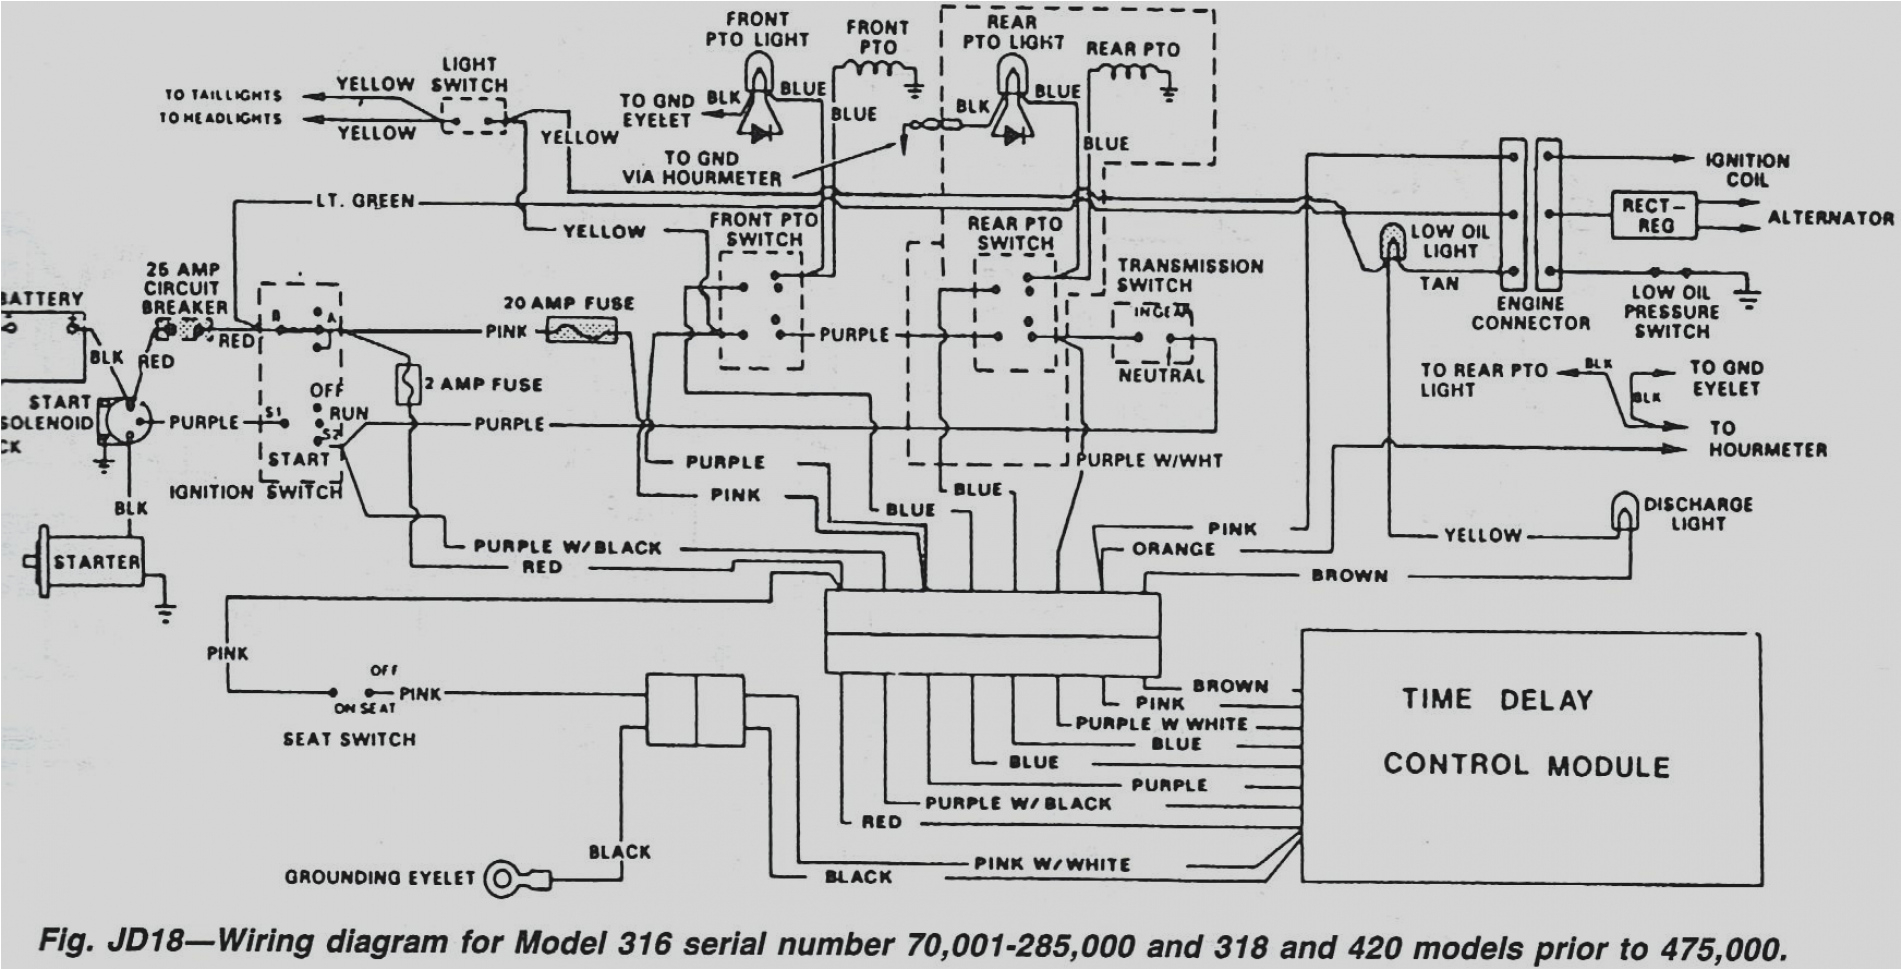 john deere 445 wiring diagram free wiring diagram collection john deere g oil filter john deere